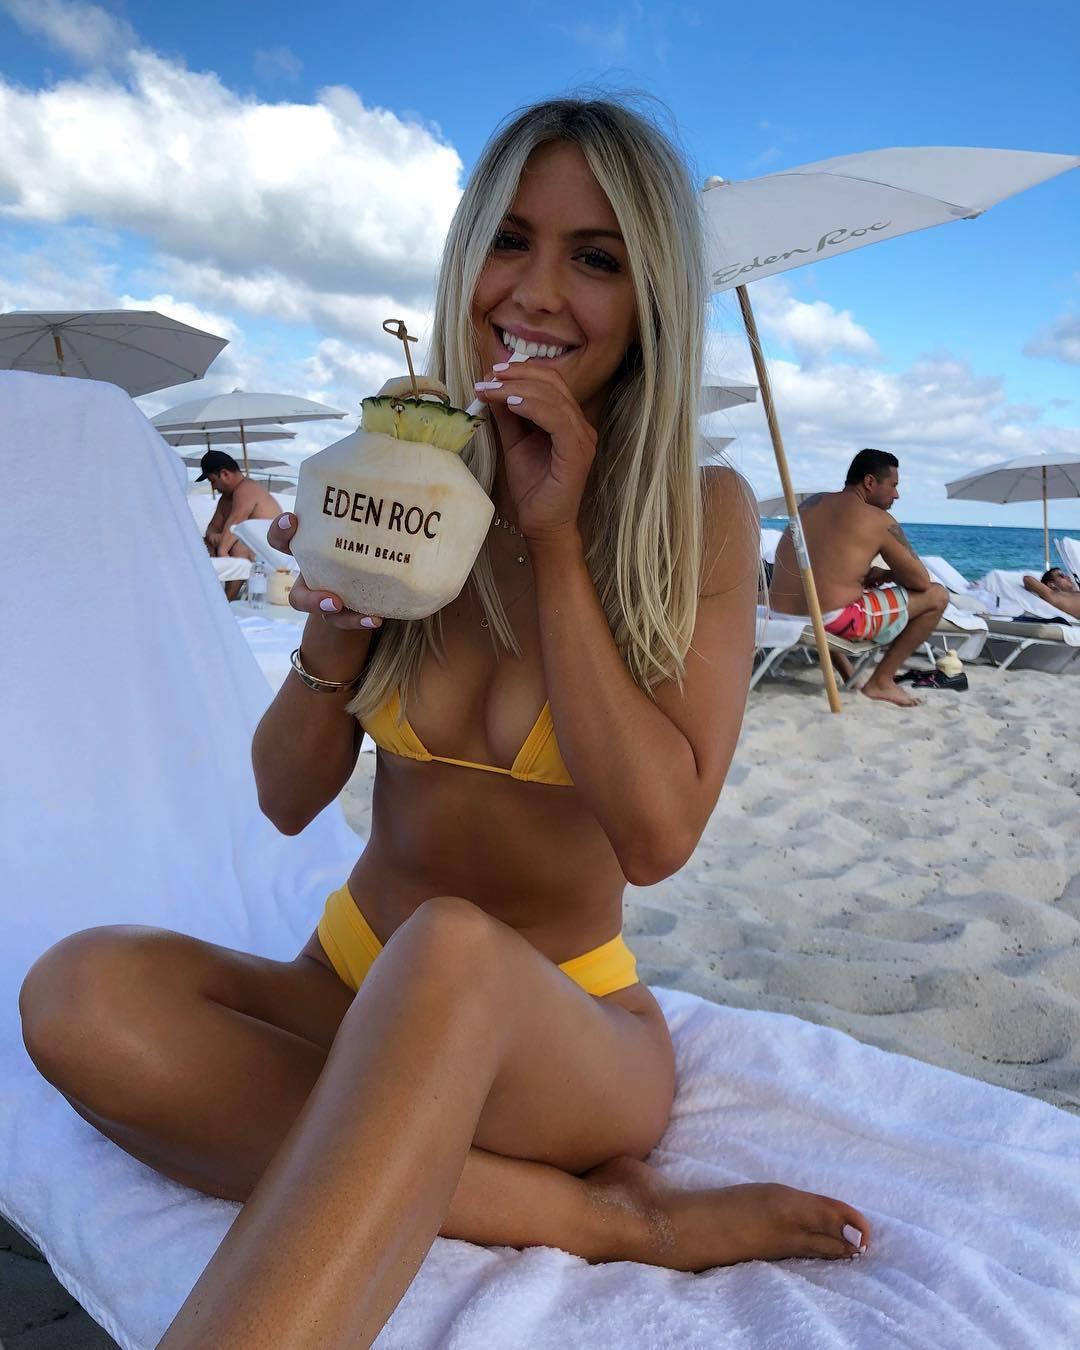 Feet Genie Bouchard nudes (13 foto and video), Sexy, Leaked, Feet, bra 2018